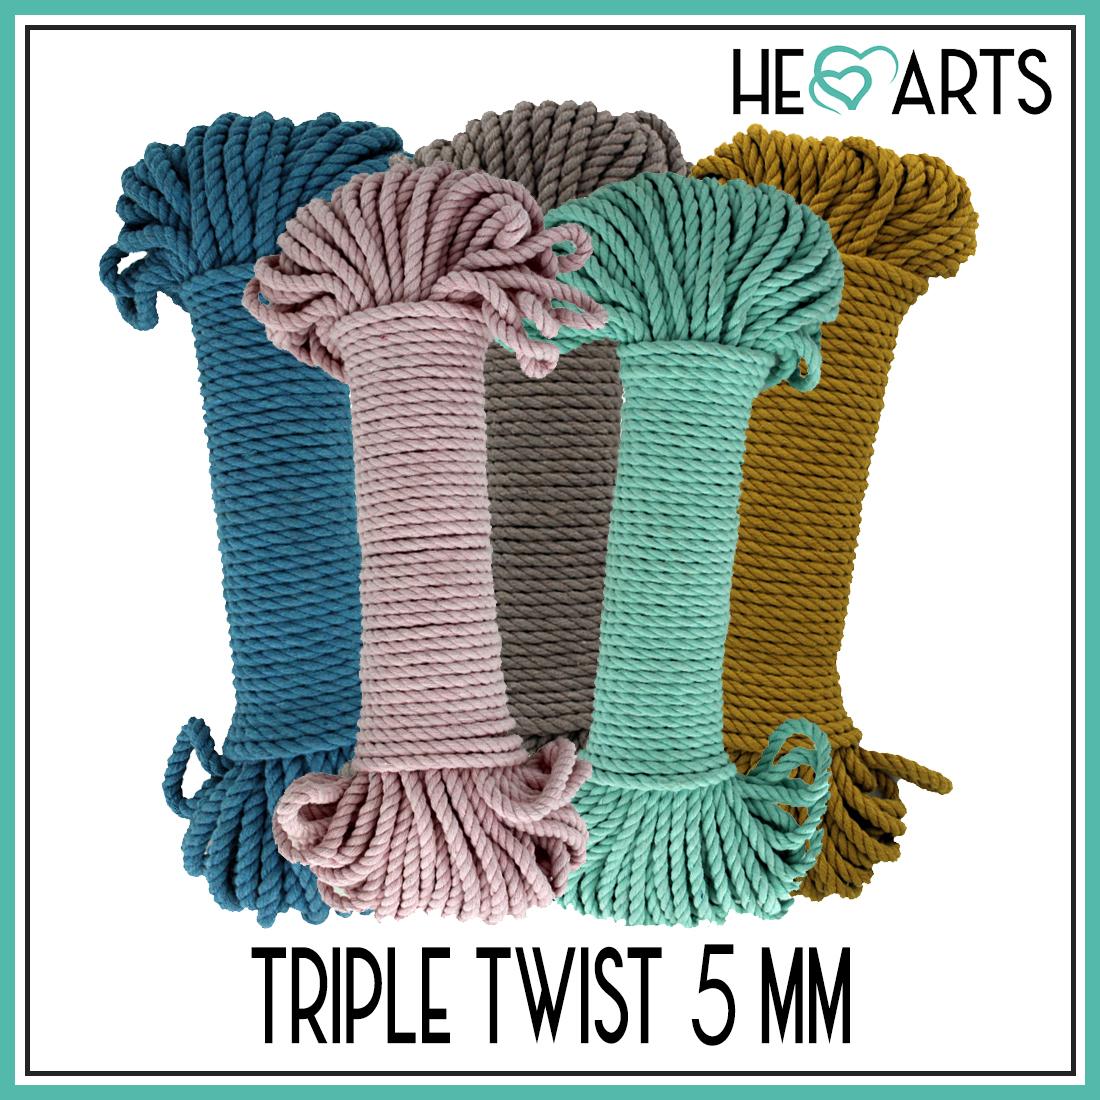 Triple twist 5 mm